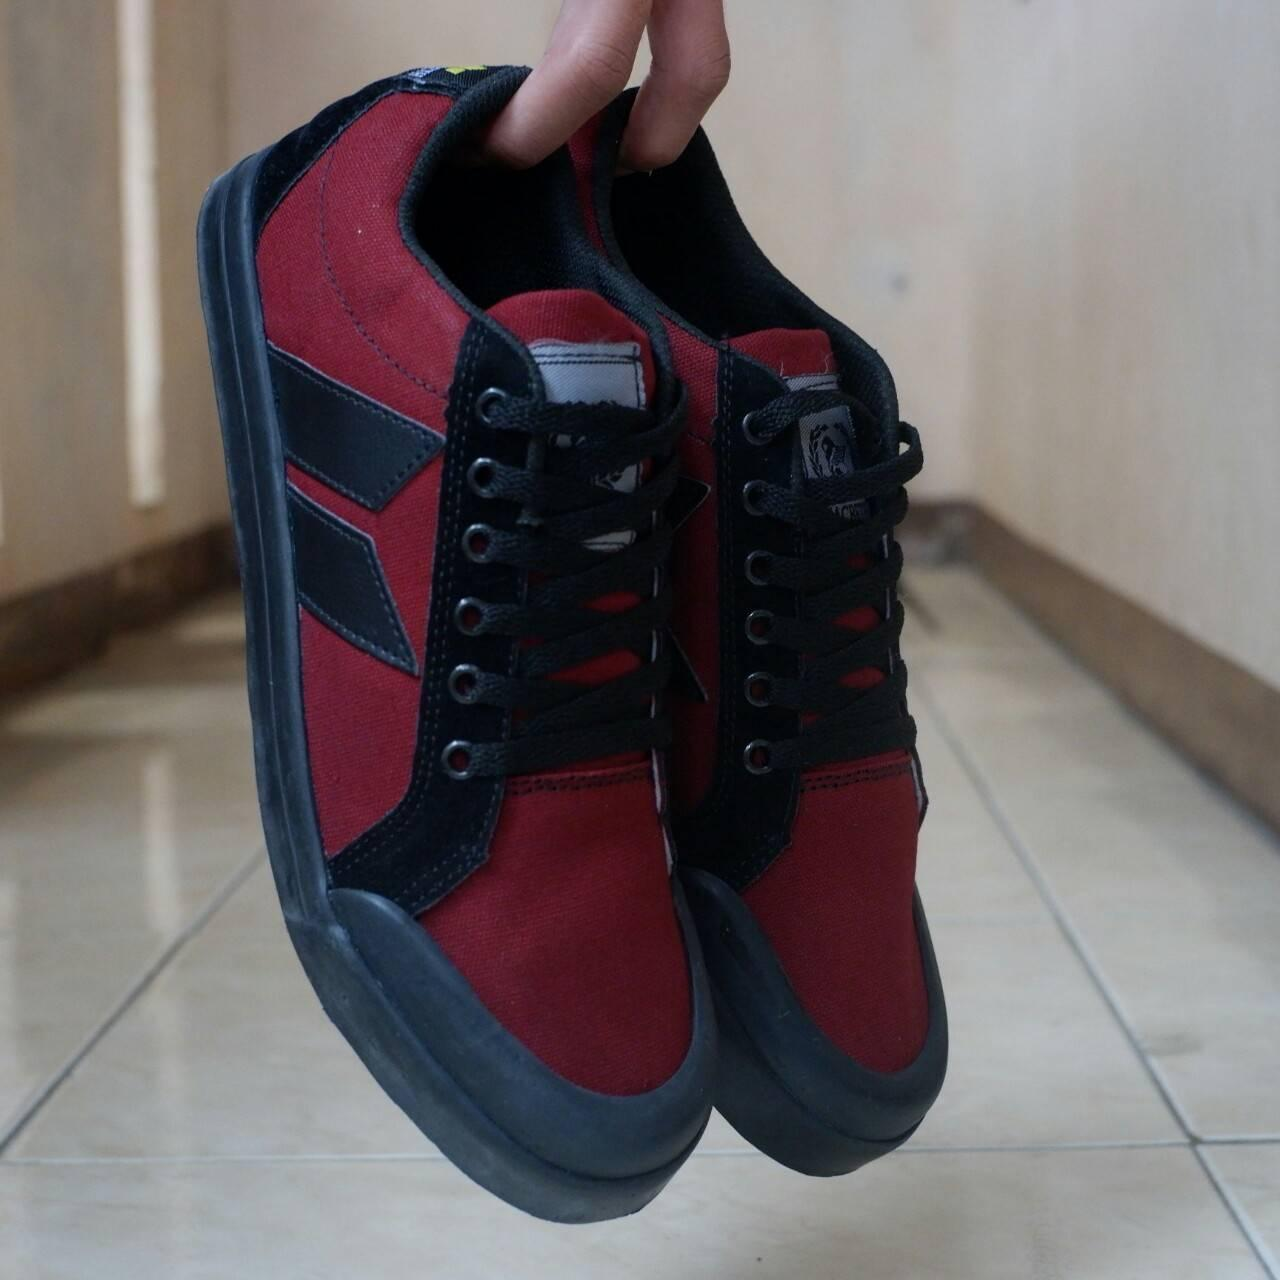 SALE...Sepatu Model MacBeth SneaKers Bonus Kaos Kaki